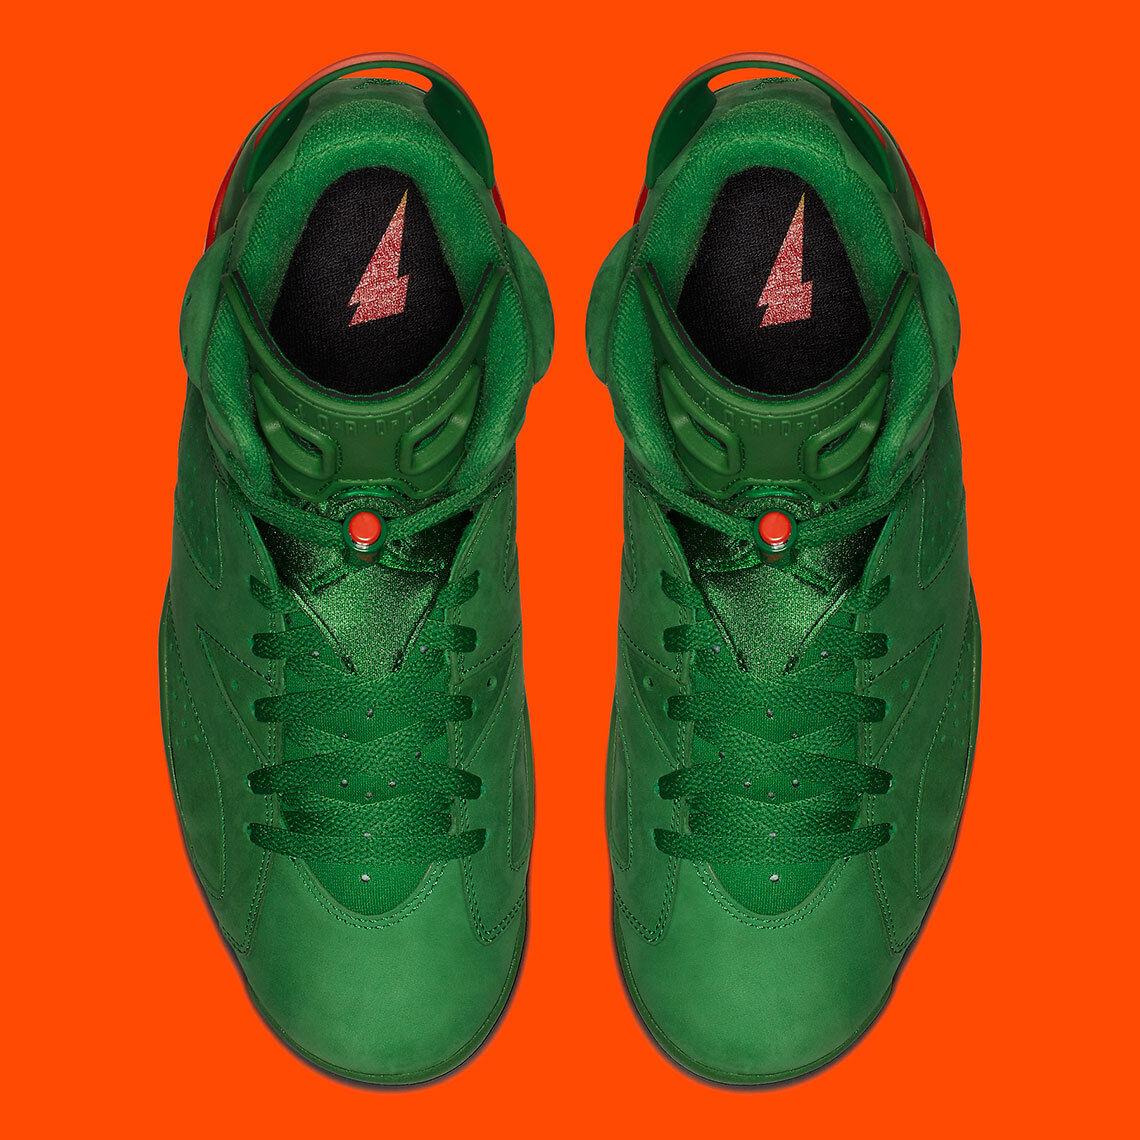 Nike Nike Nike AIR JORDAN 6 VI RETRO  AJ5986-335 Pine Green Gatorade x SZ  12 New W Rec. cd3eb6